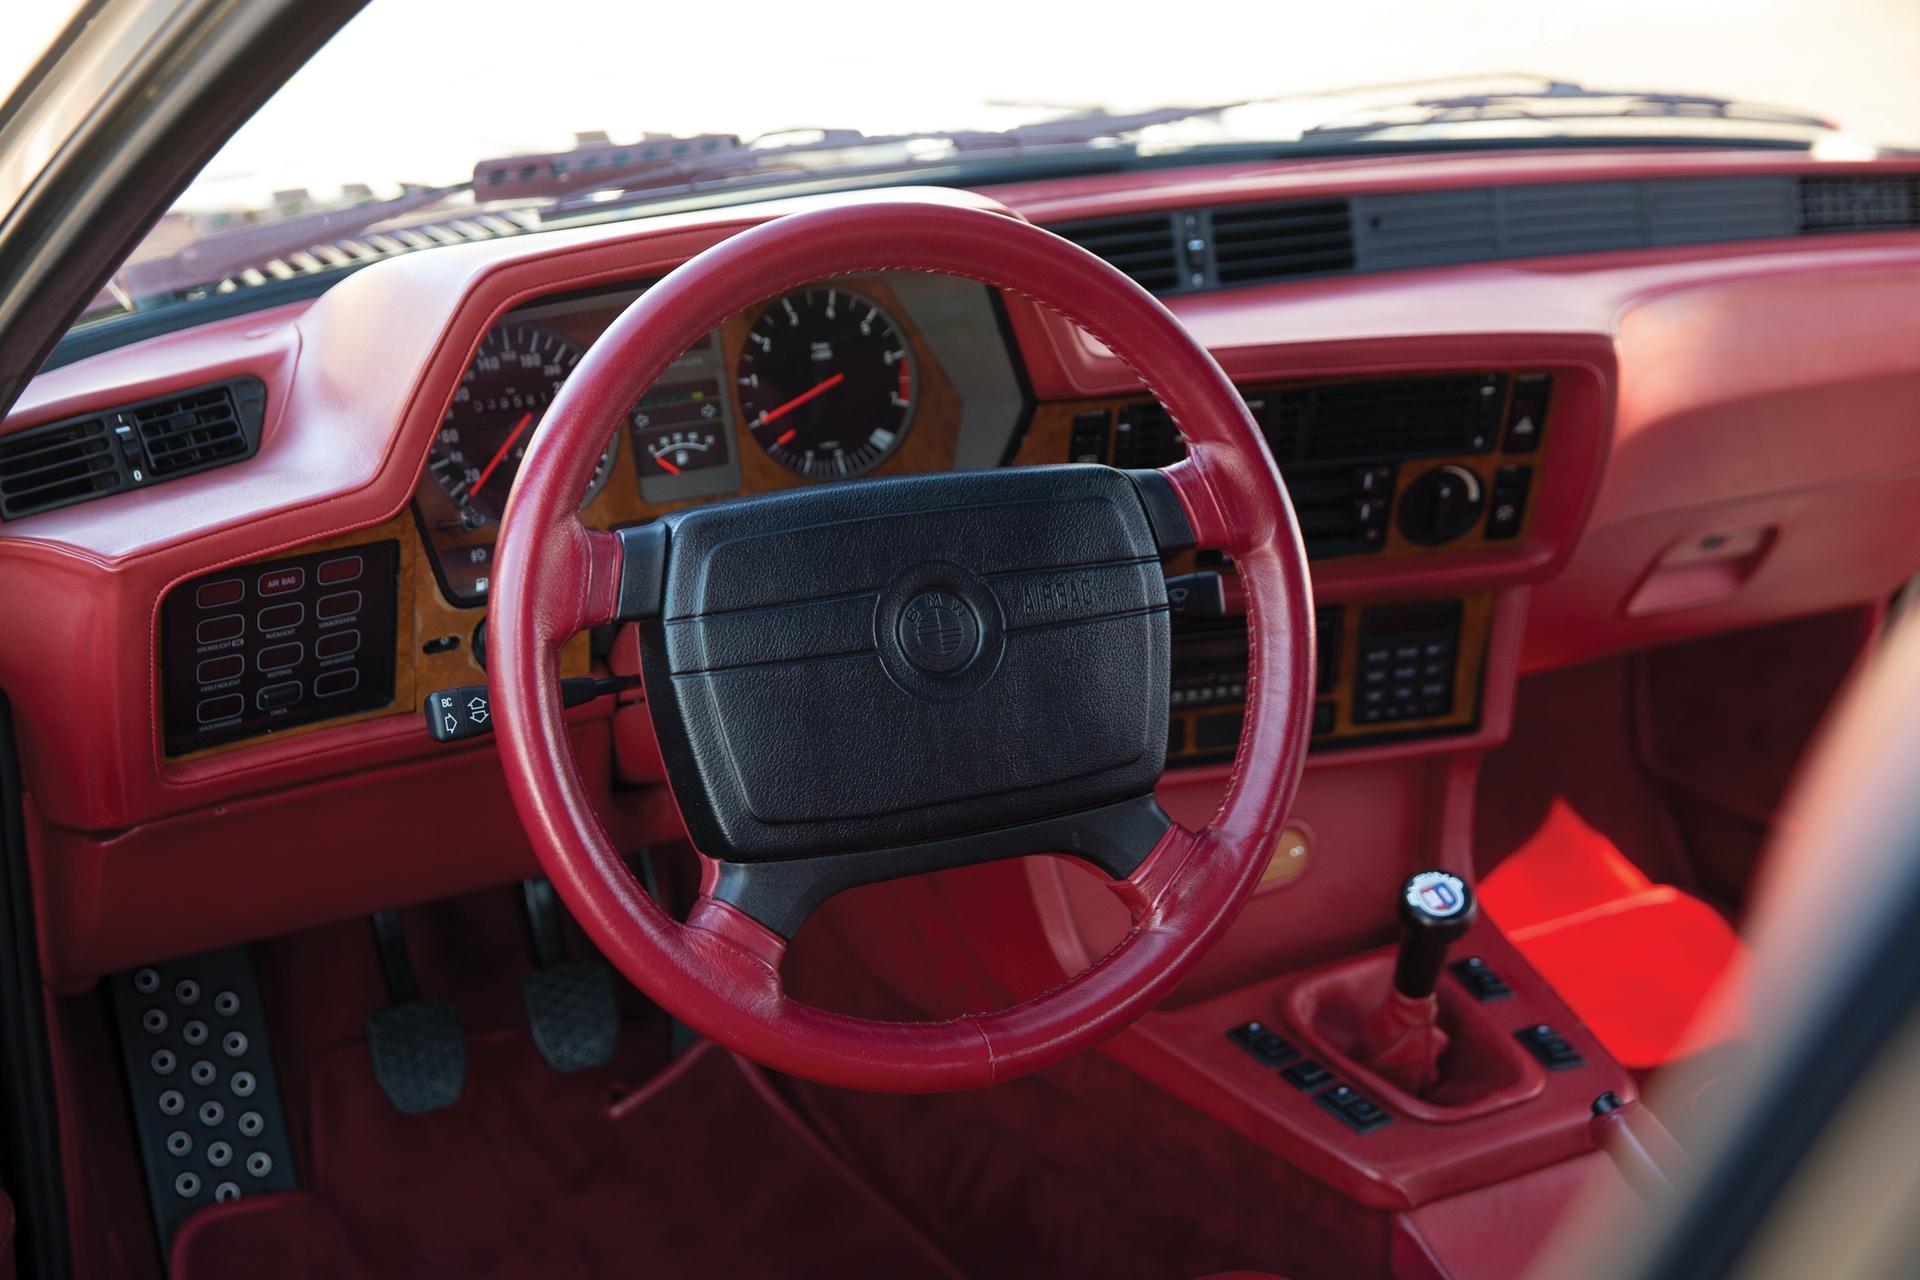 1987-BMW-Alpina-B7-Turbo-Coupe_3_3